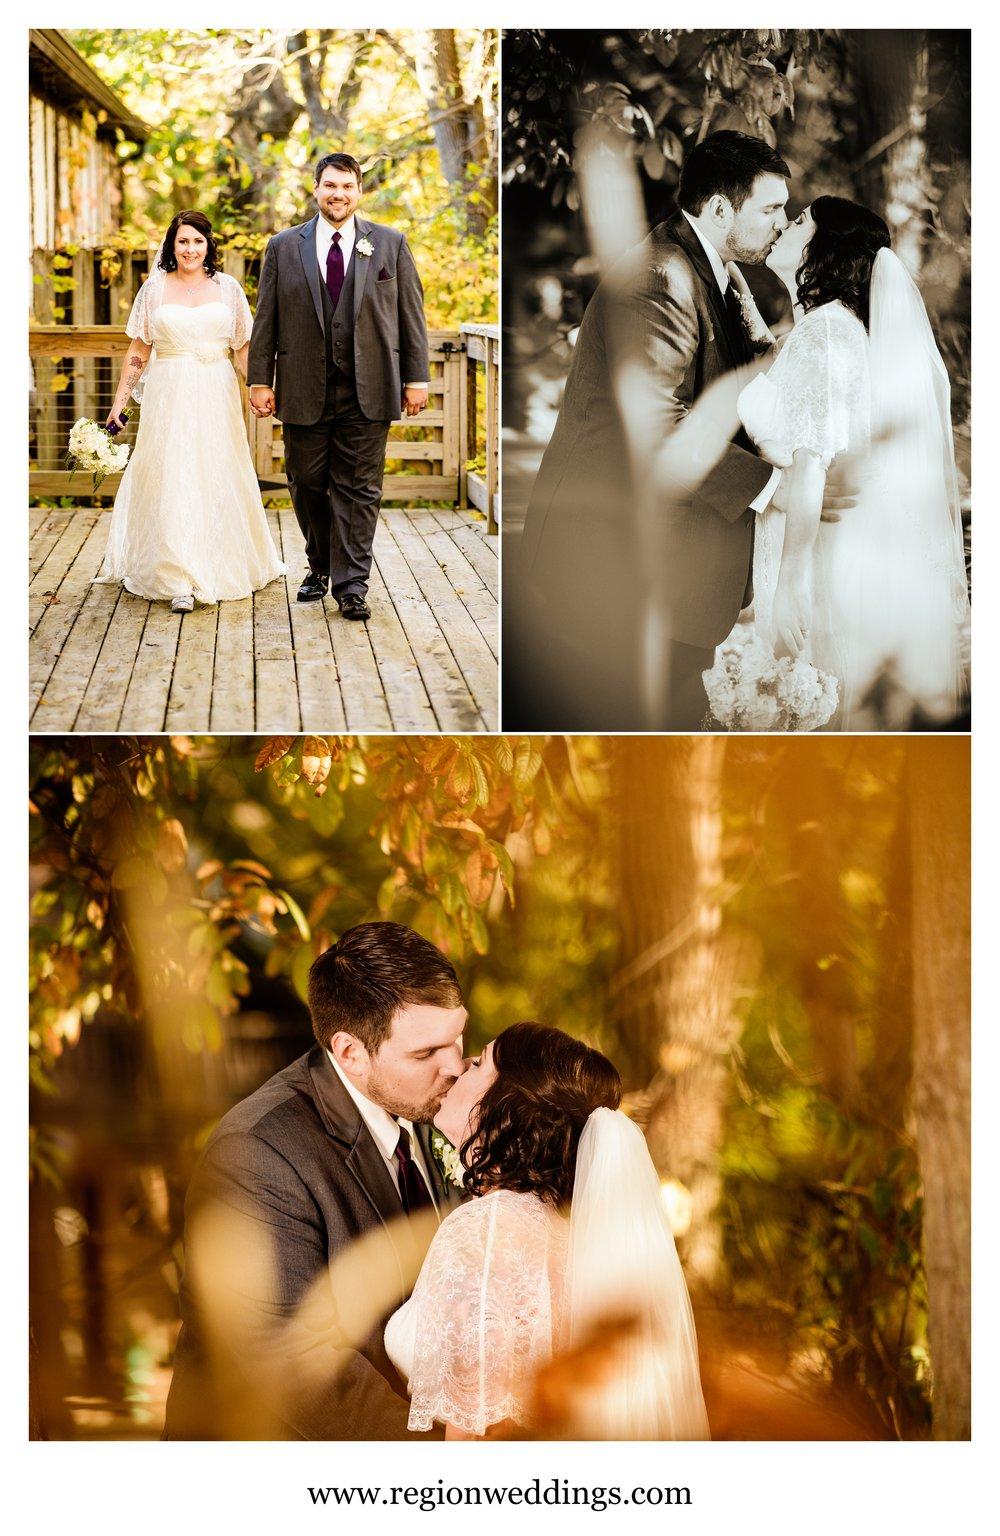 Wedding photos at Spring House Inn.